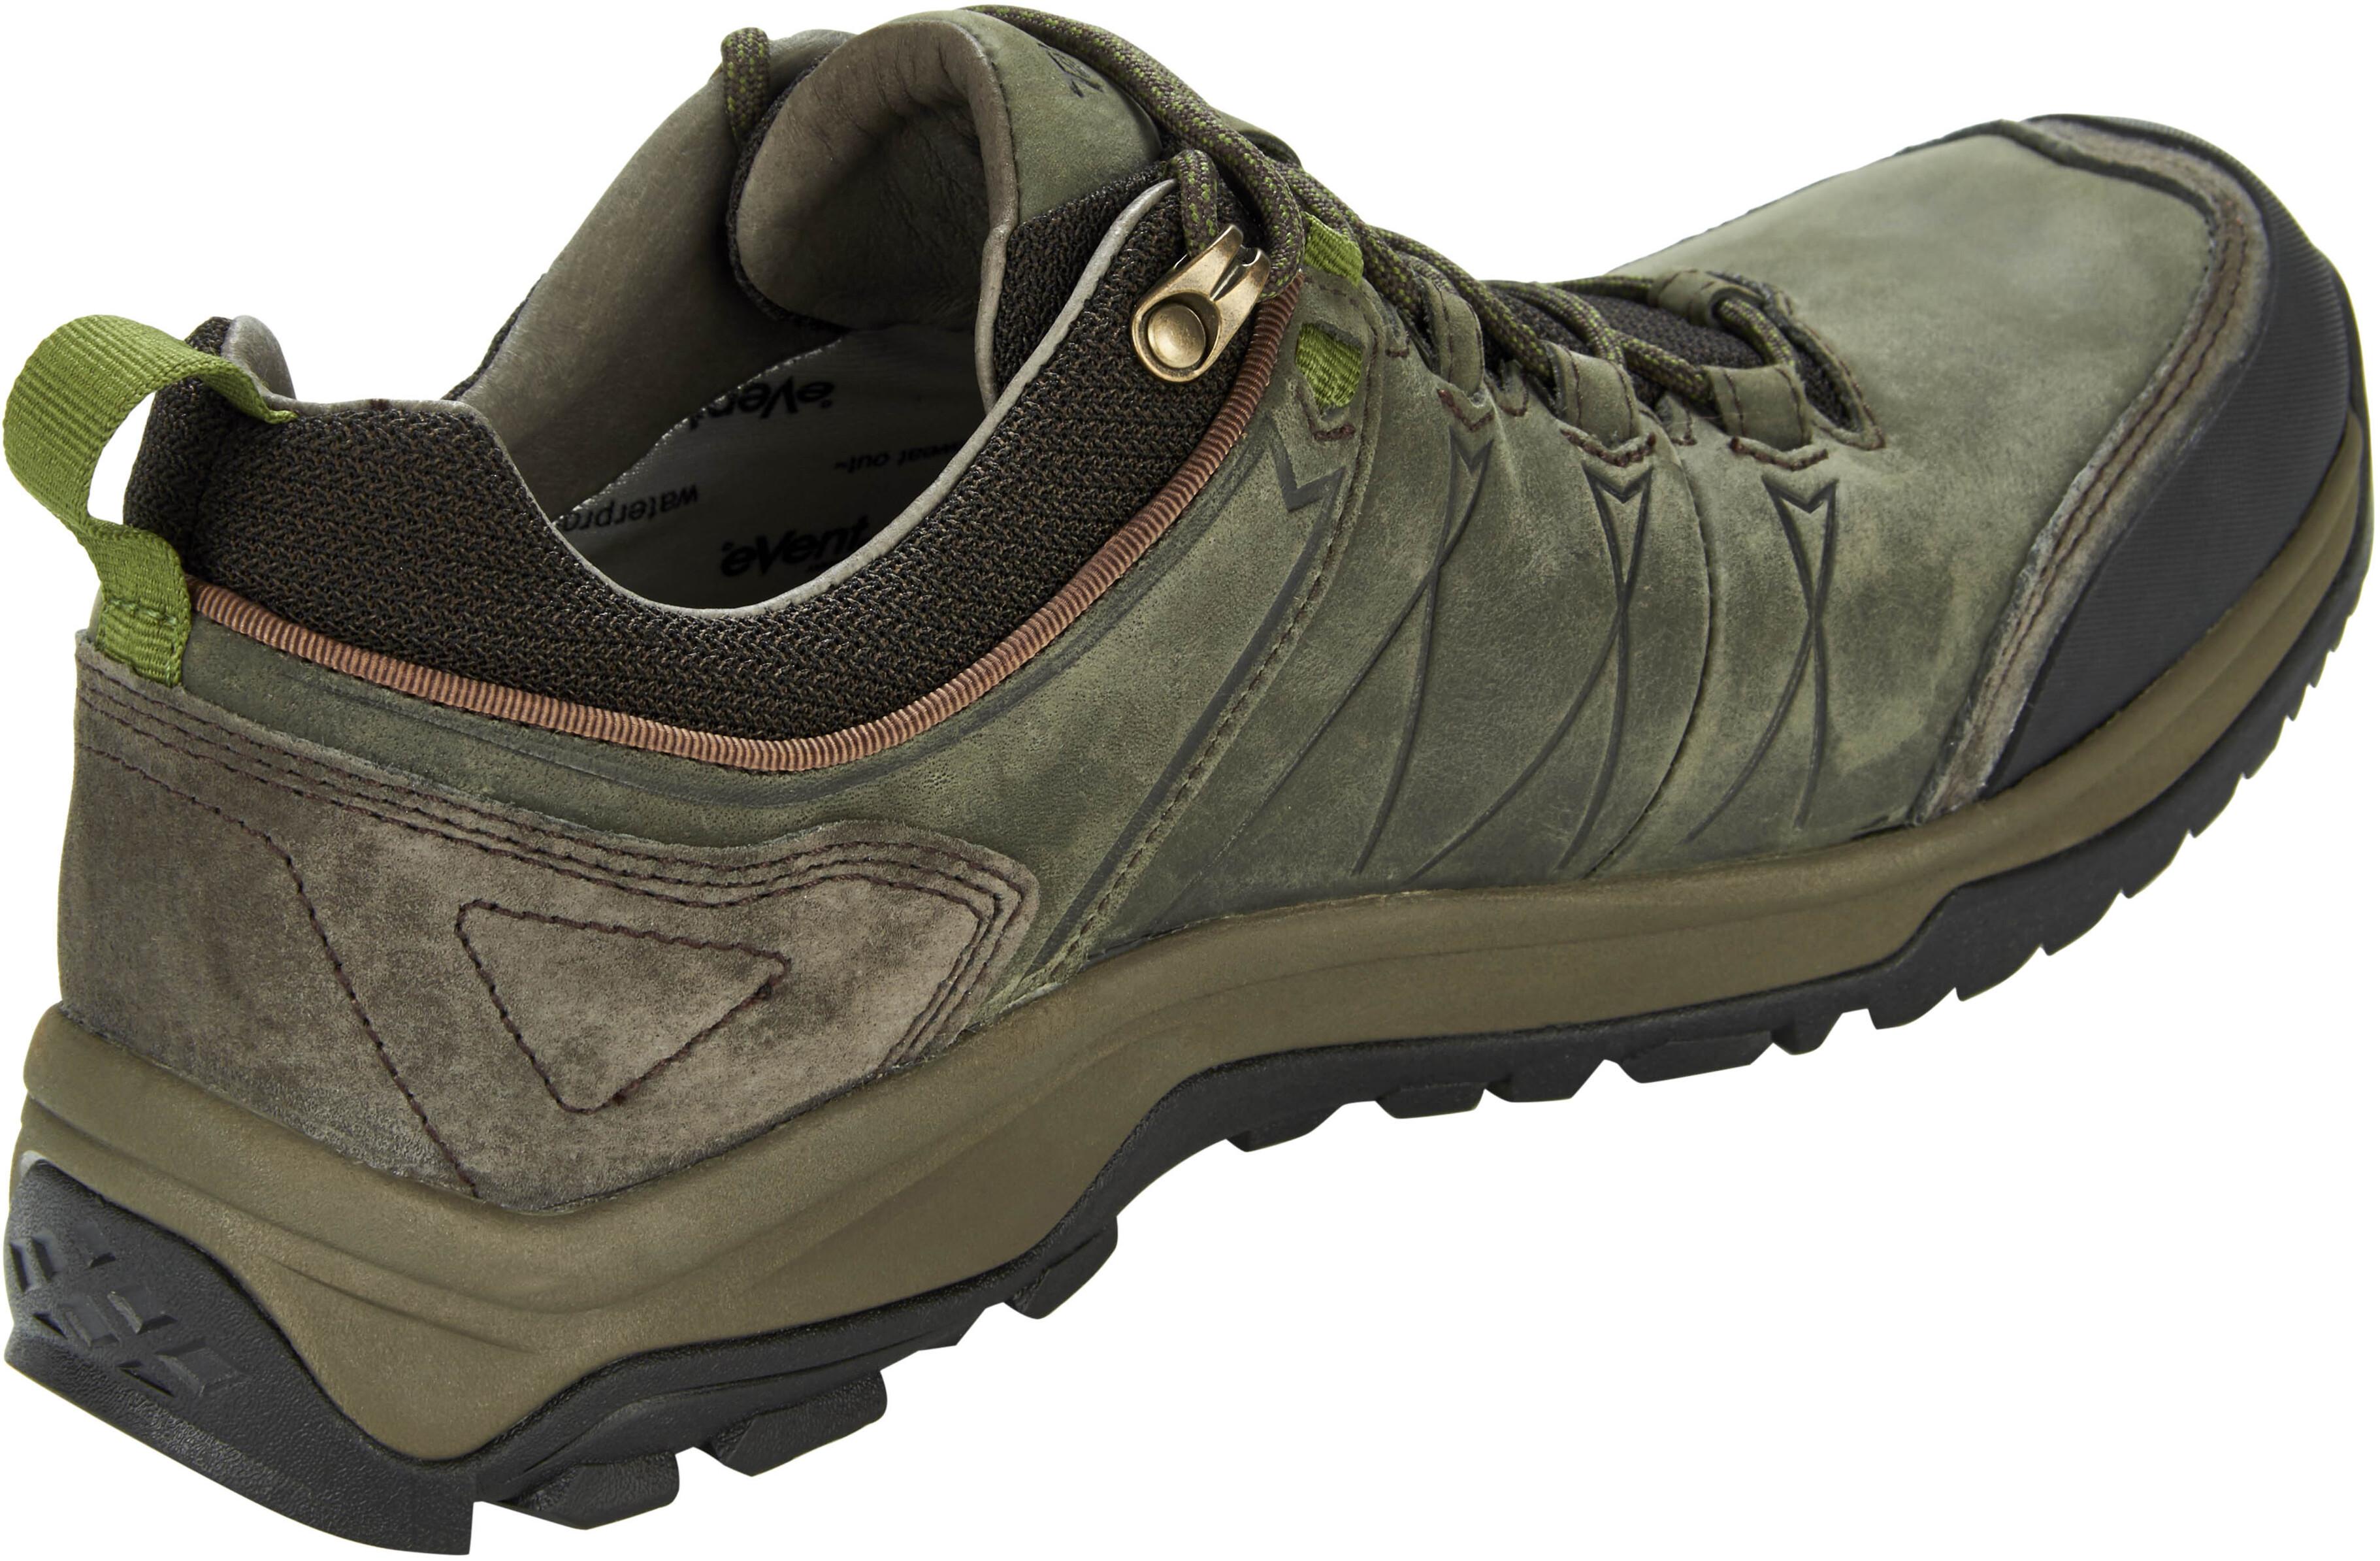 37ea667339b1 Teva Arrowood Riva WP Shoes Men black olive at Addnature.co.uk